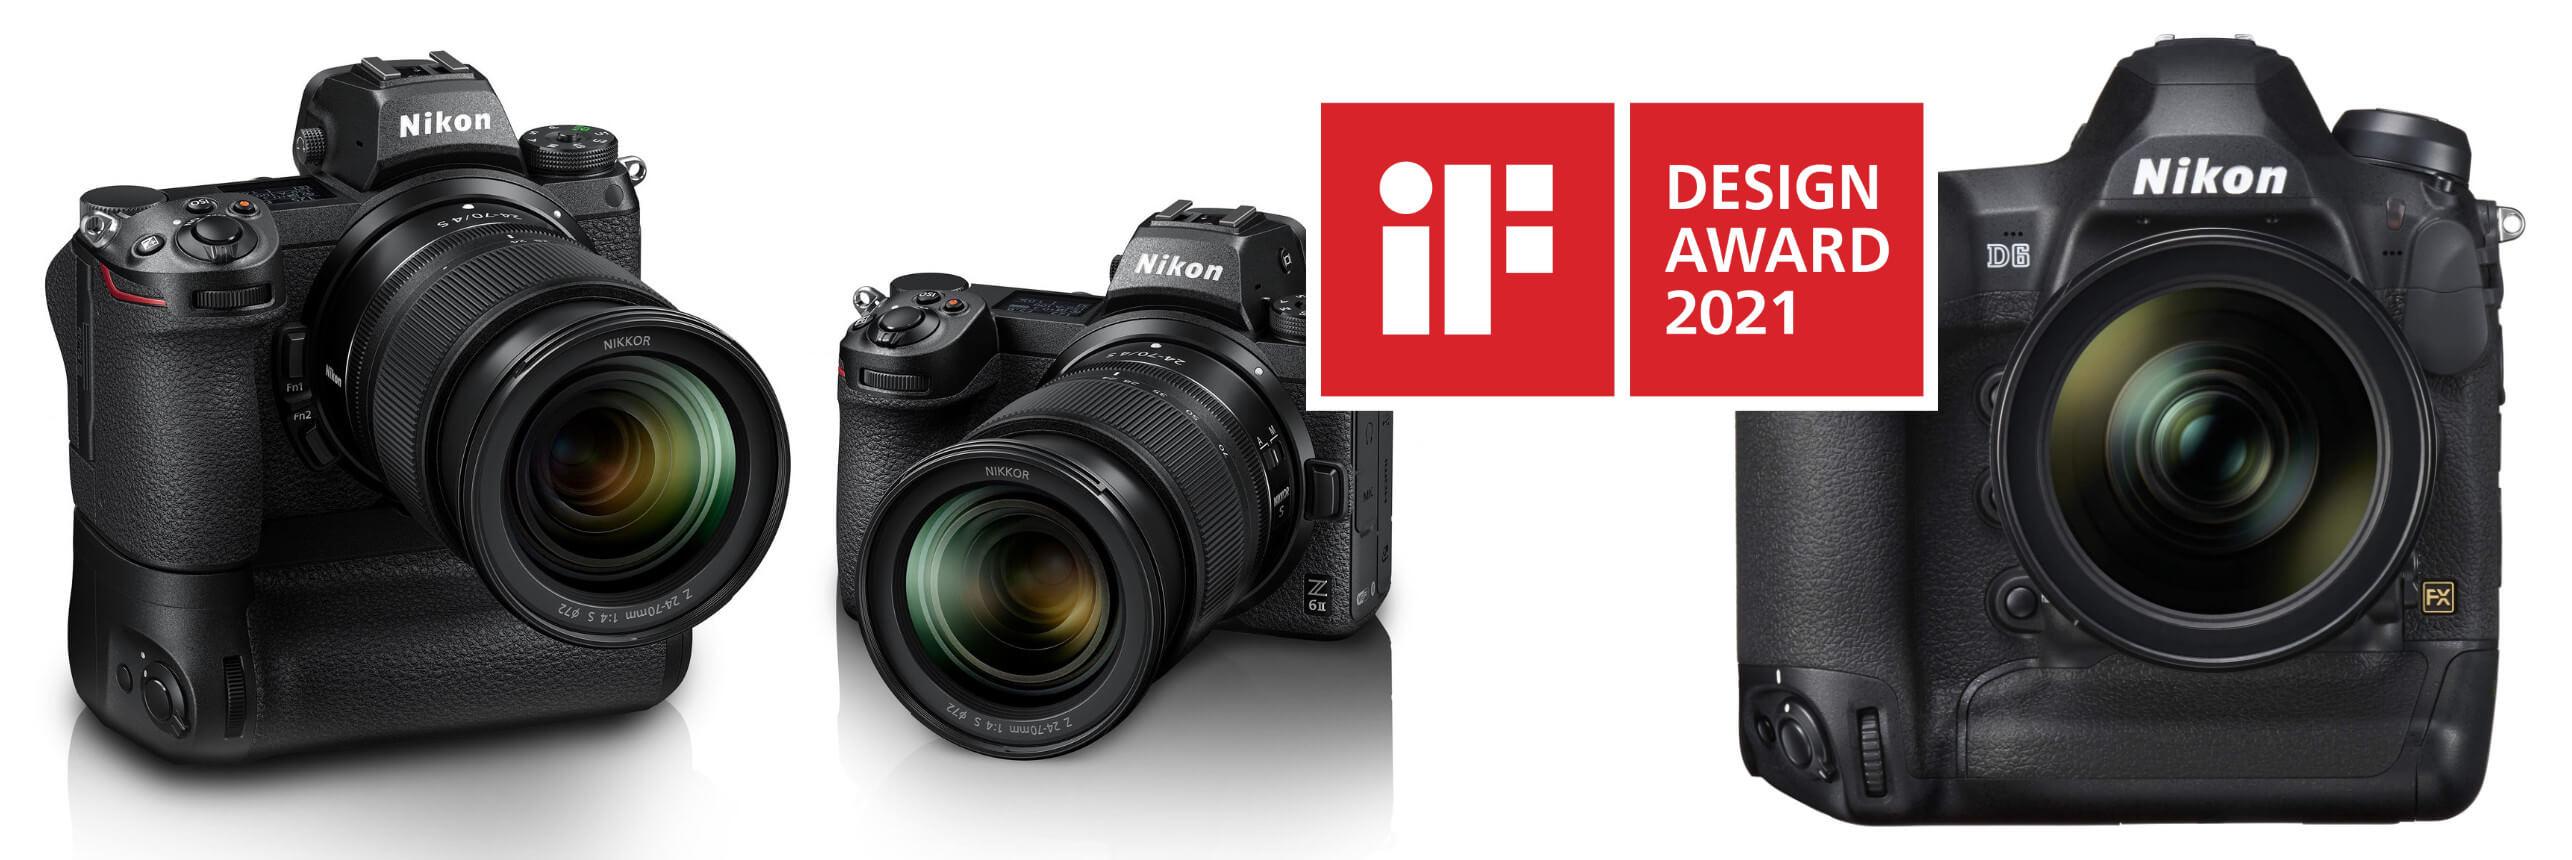 Kvalita potvrzena –iF Design Award 2021 pro Nikon